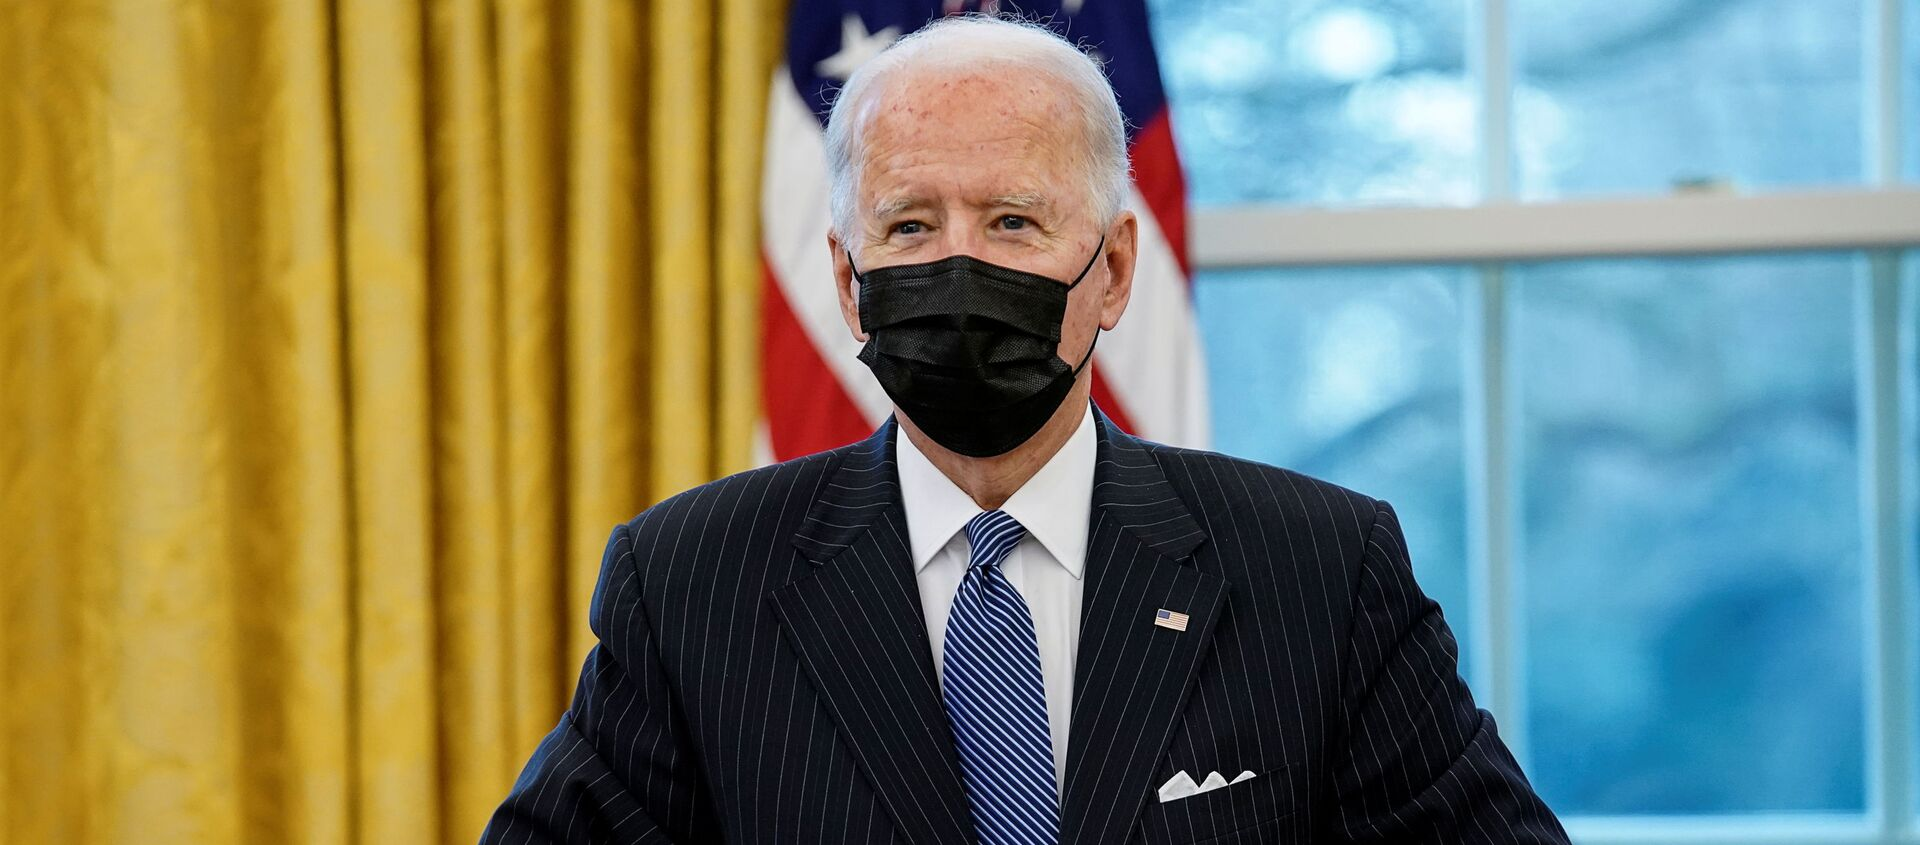 Joe Biden, presidente de EEUU  - Sputnik Mundo, 1920, 26.01.2021